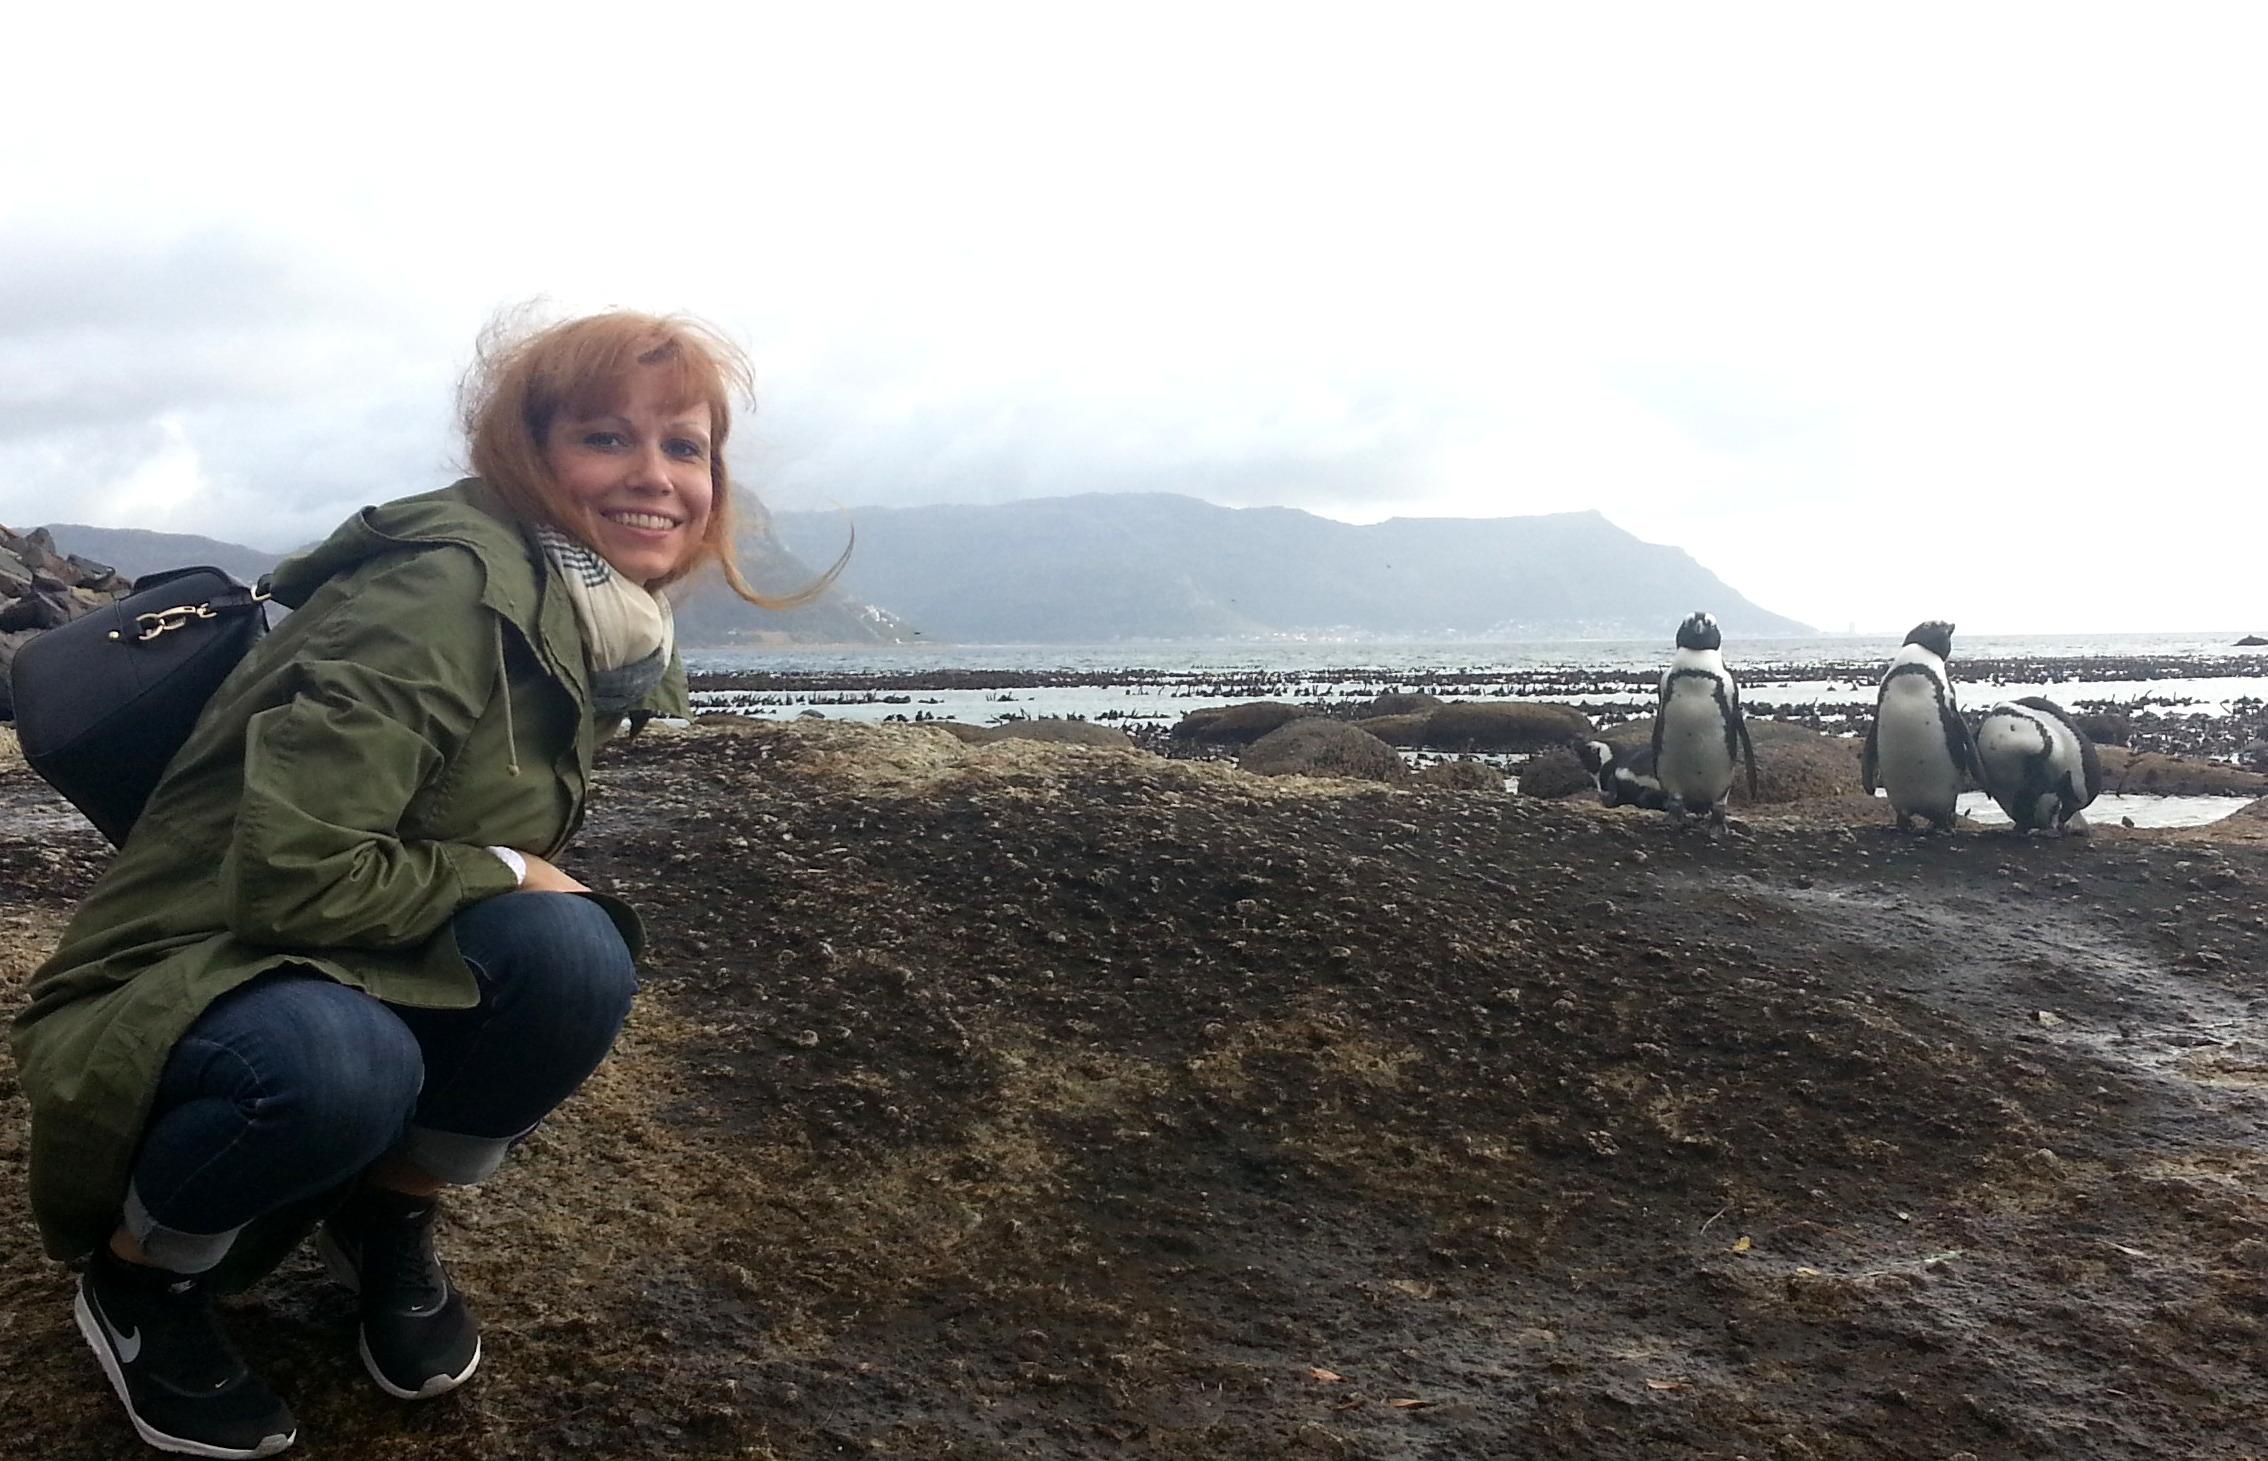 Südafrika entdecken: Kapstadt und die Kaphalbinsel suedafrika sonne safari land und leute reisebericht  TUI Berlin Reisebuero Südafrika Reisebericht Boulders Beach 1